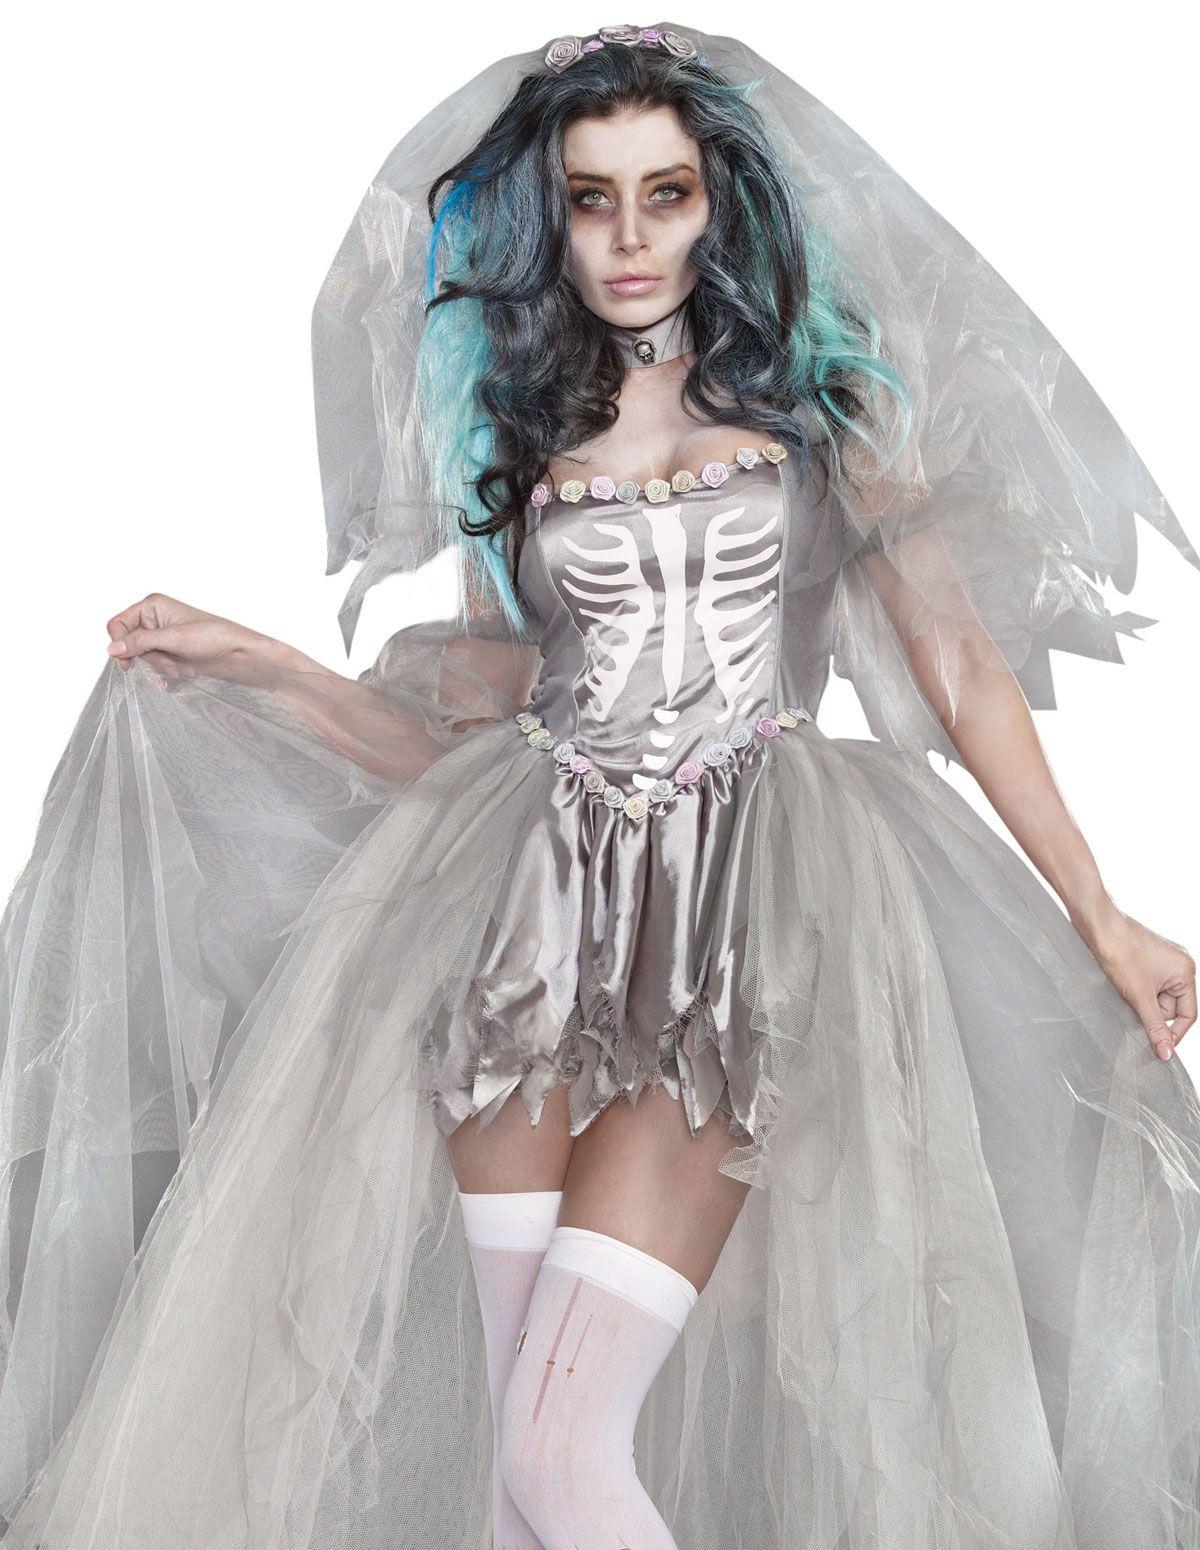 Bride costume image by AmandaPanda on halloweeennnnn